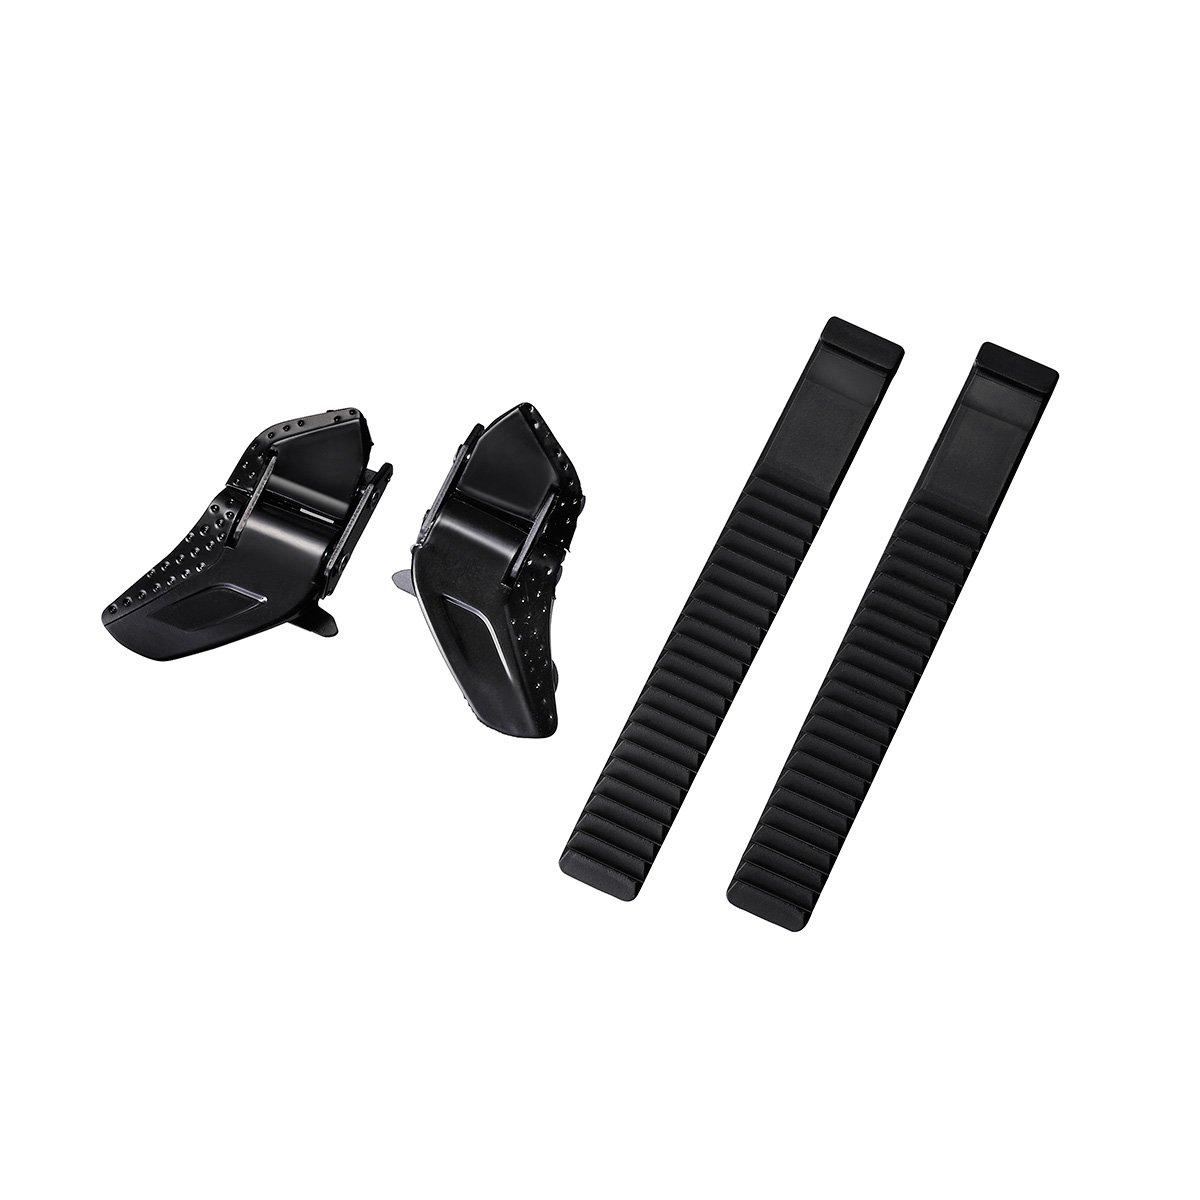 Fizik L5 Cycling Shoe Boa Replacement Kit Black Introduction To 7400 Series Digital Logic Devices Fizix Shimano Low Profile Buckle W Strap Set